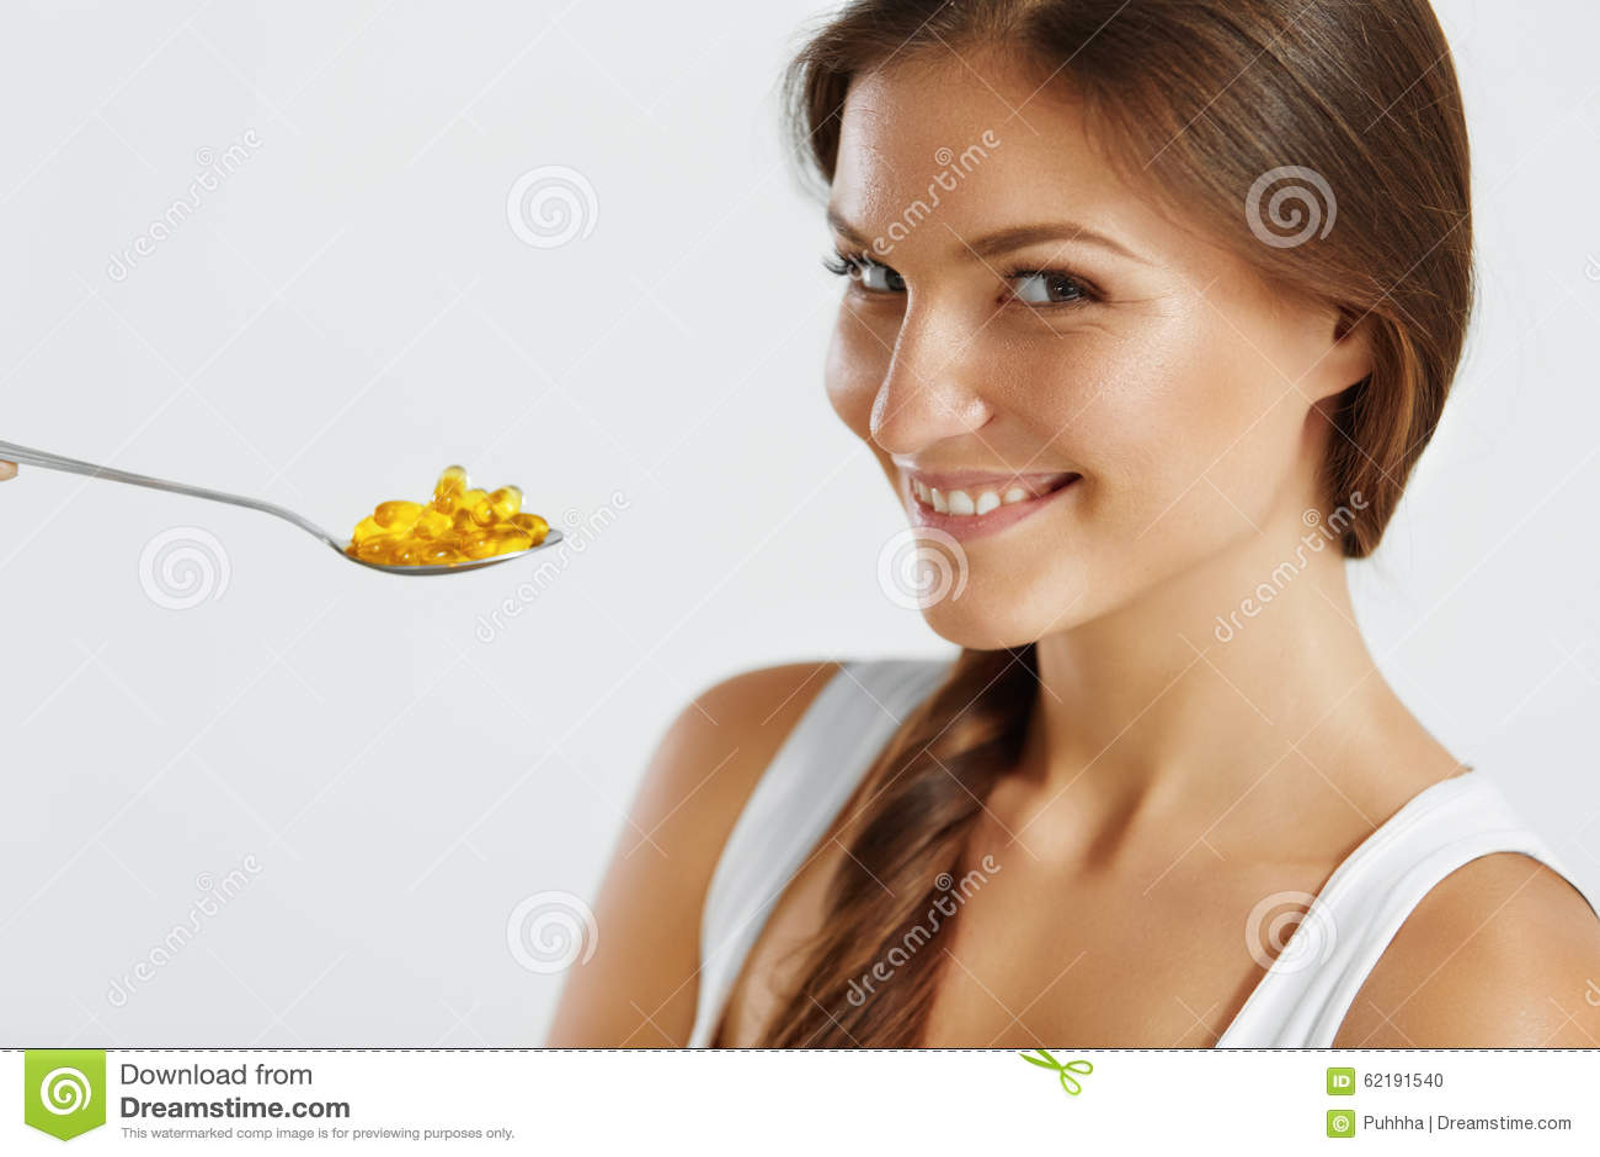 Gesunder Lebensstil nahrung Vitamine Gesundes Essen Frau Wi